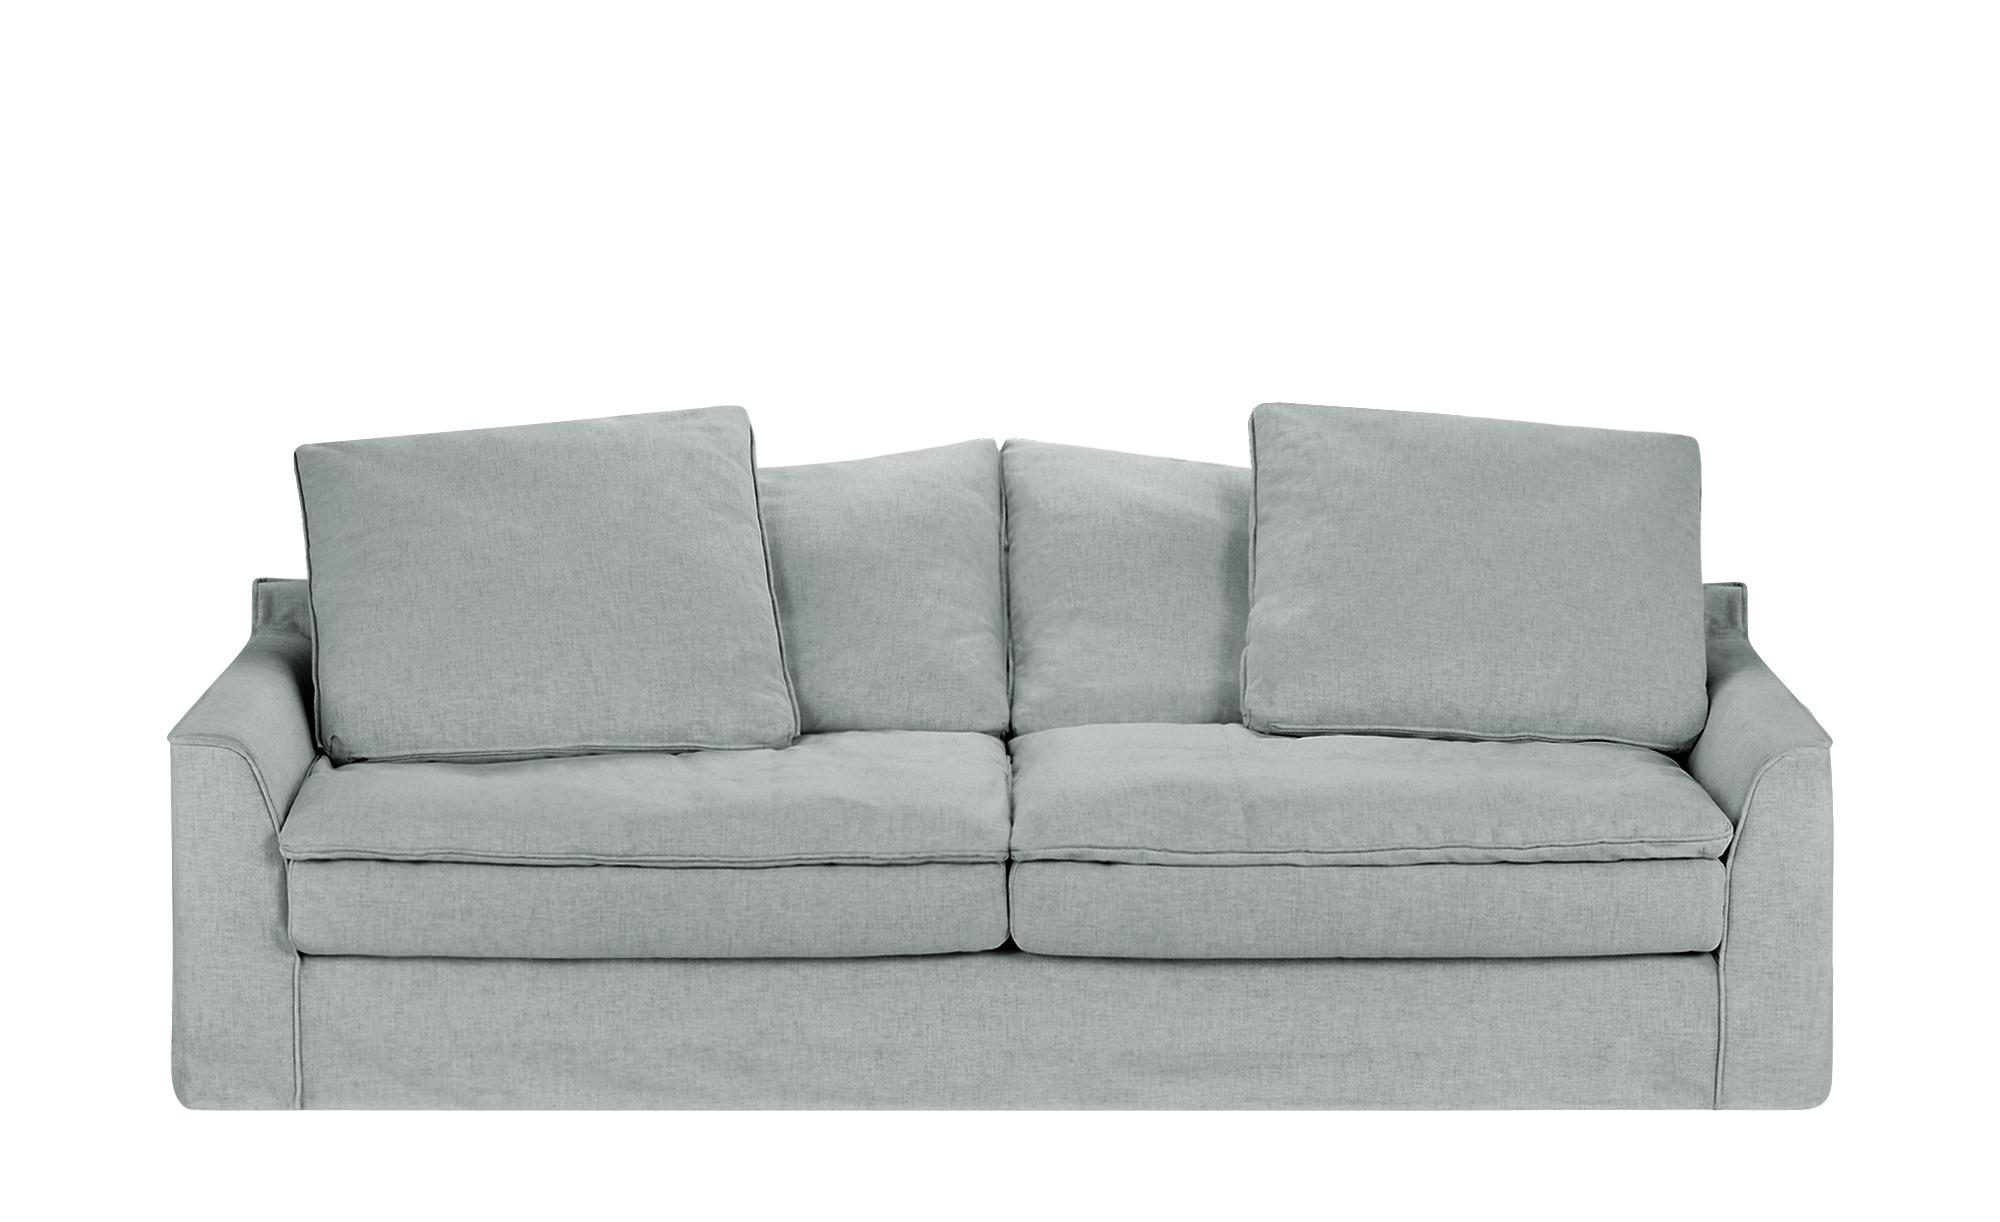 SOHO Sofa 3-sitzig  Sarvika ¦ grau ¦ Maße (cm): B: 233 H: 95 T: 114 Polstermöbel > Sofas > 3-Sitzer - Höffner